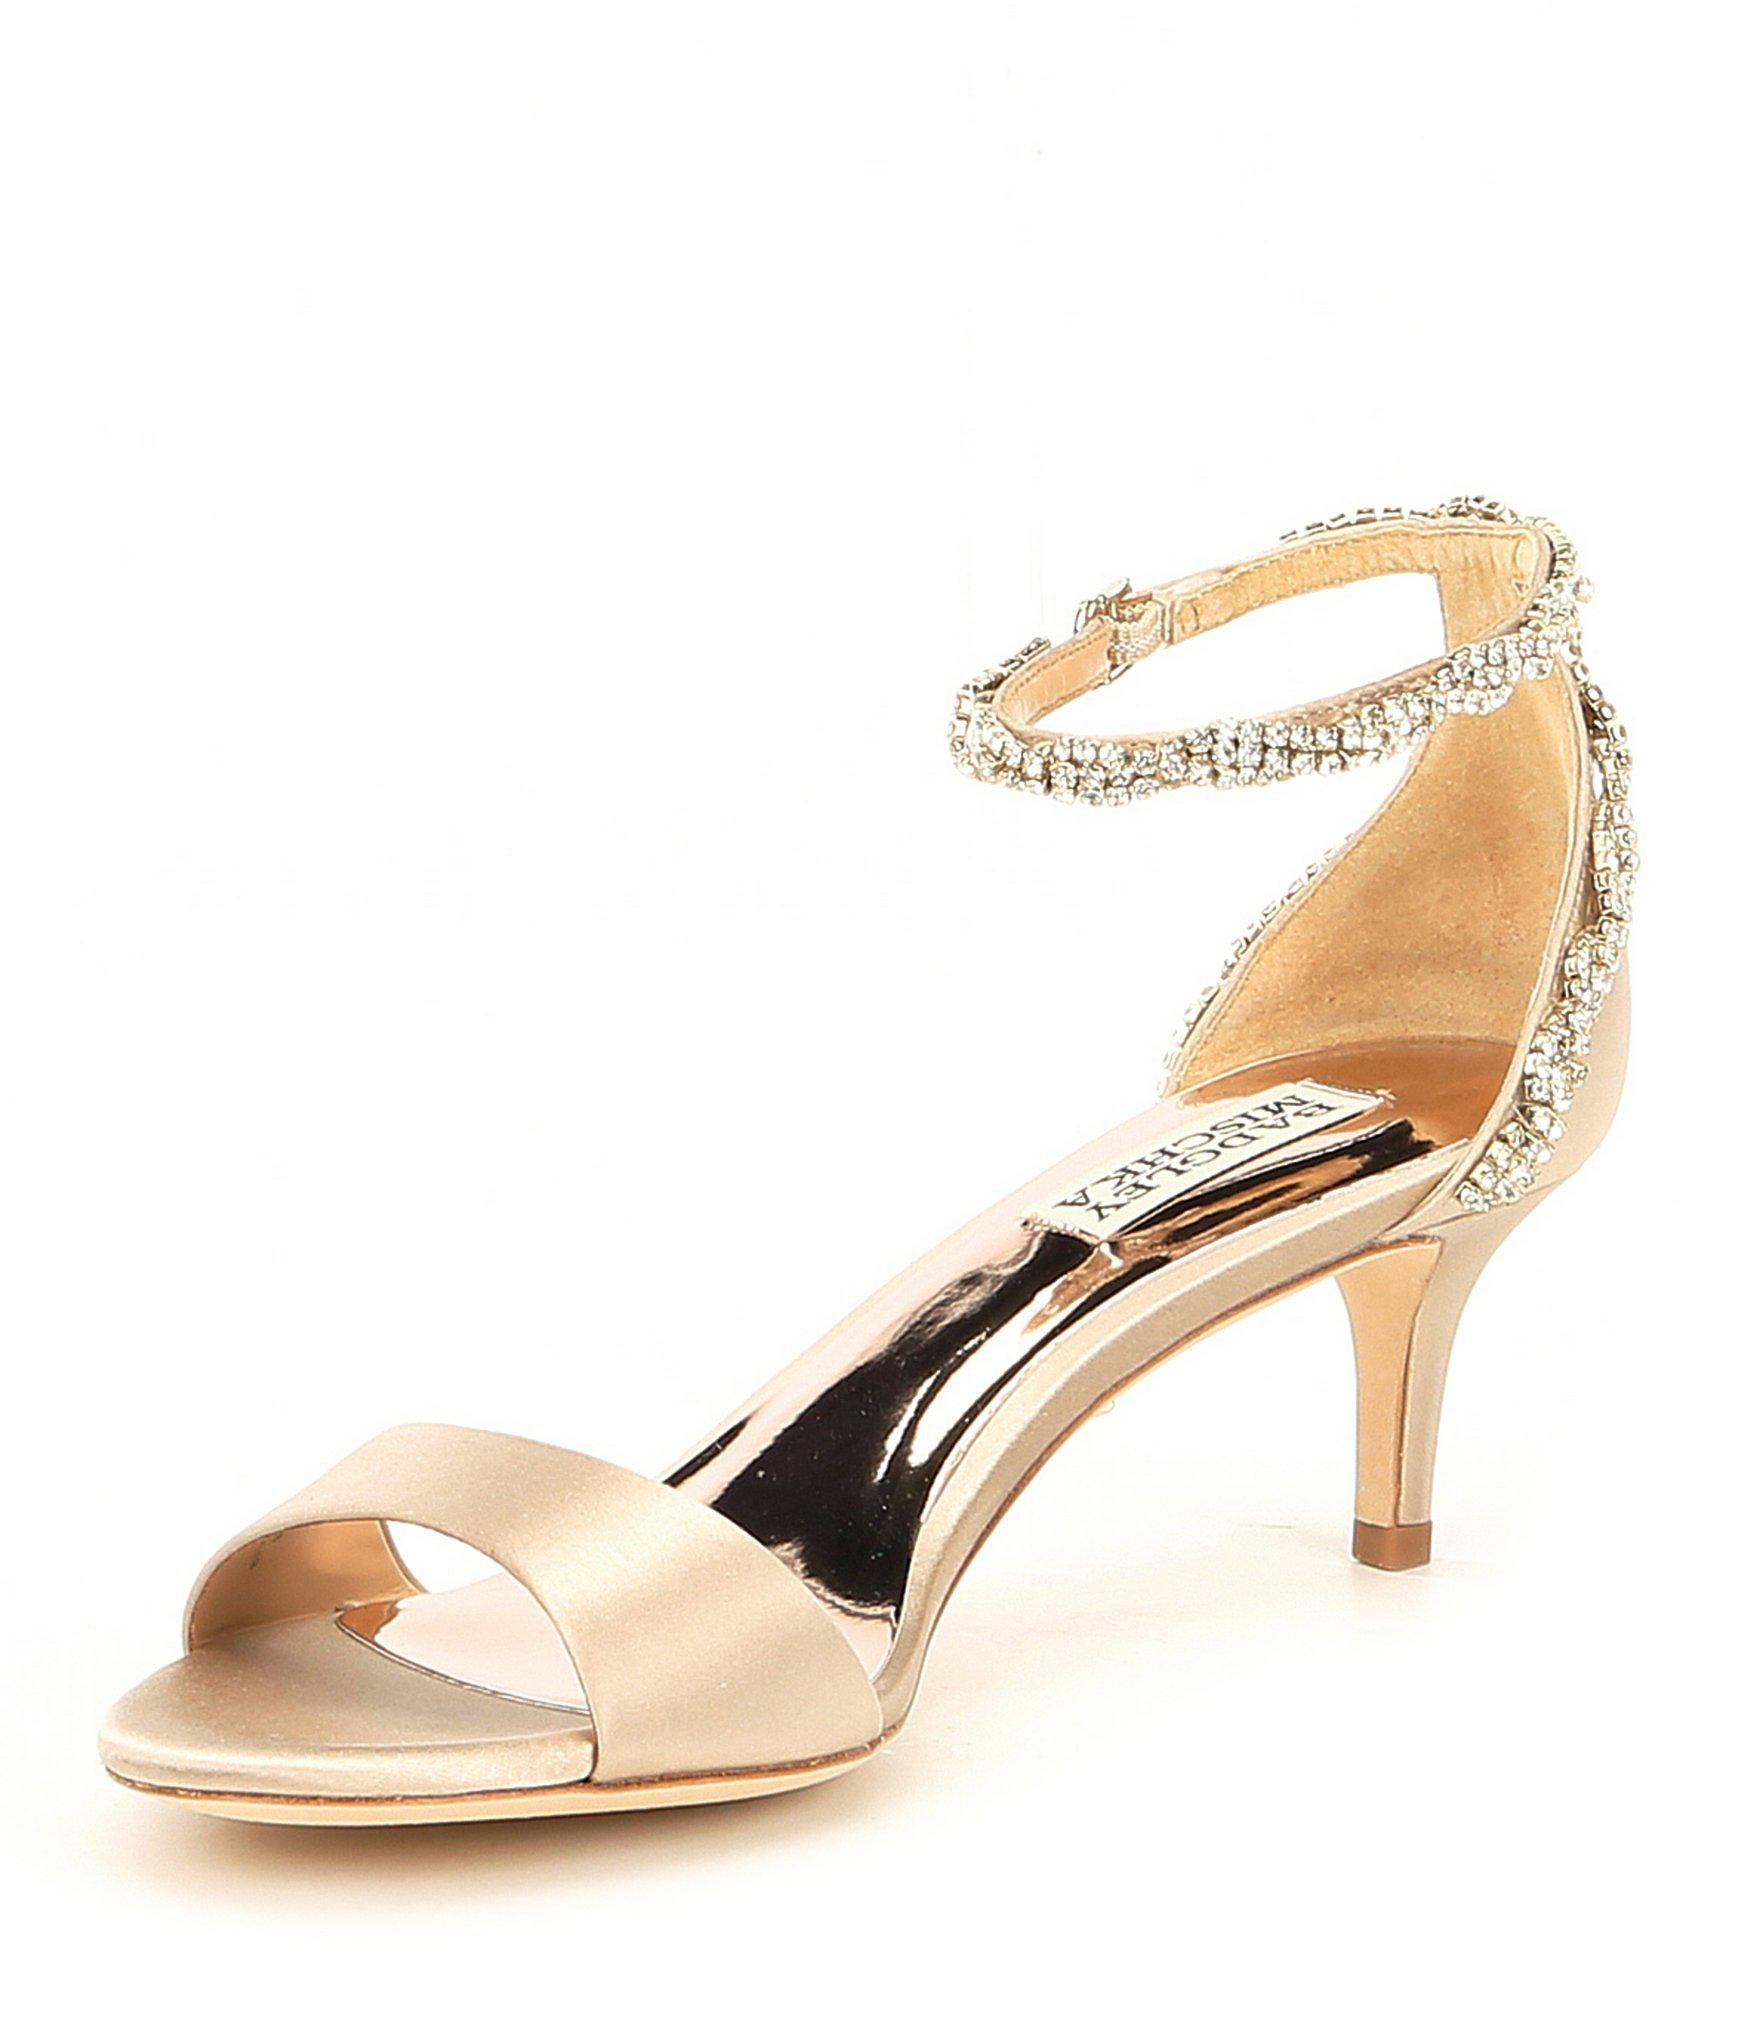 bf6b5a90bbb Lyst - Badgley Mischka Yareli Rhinestone Jeweled Satin Ankle Strap ...